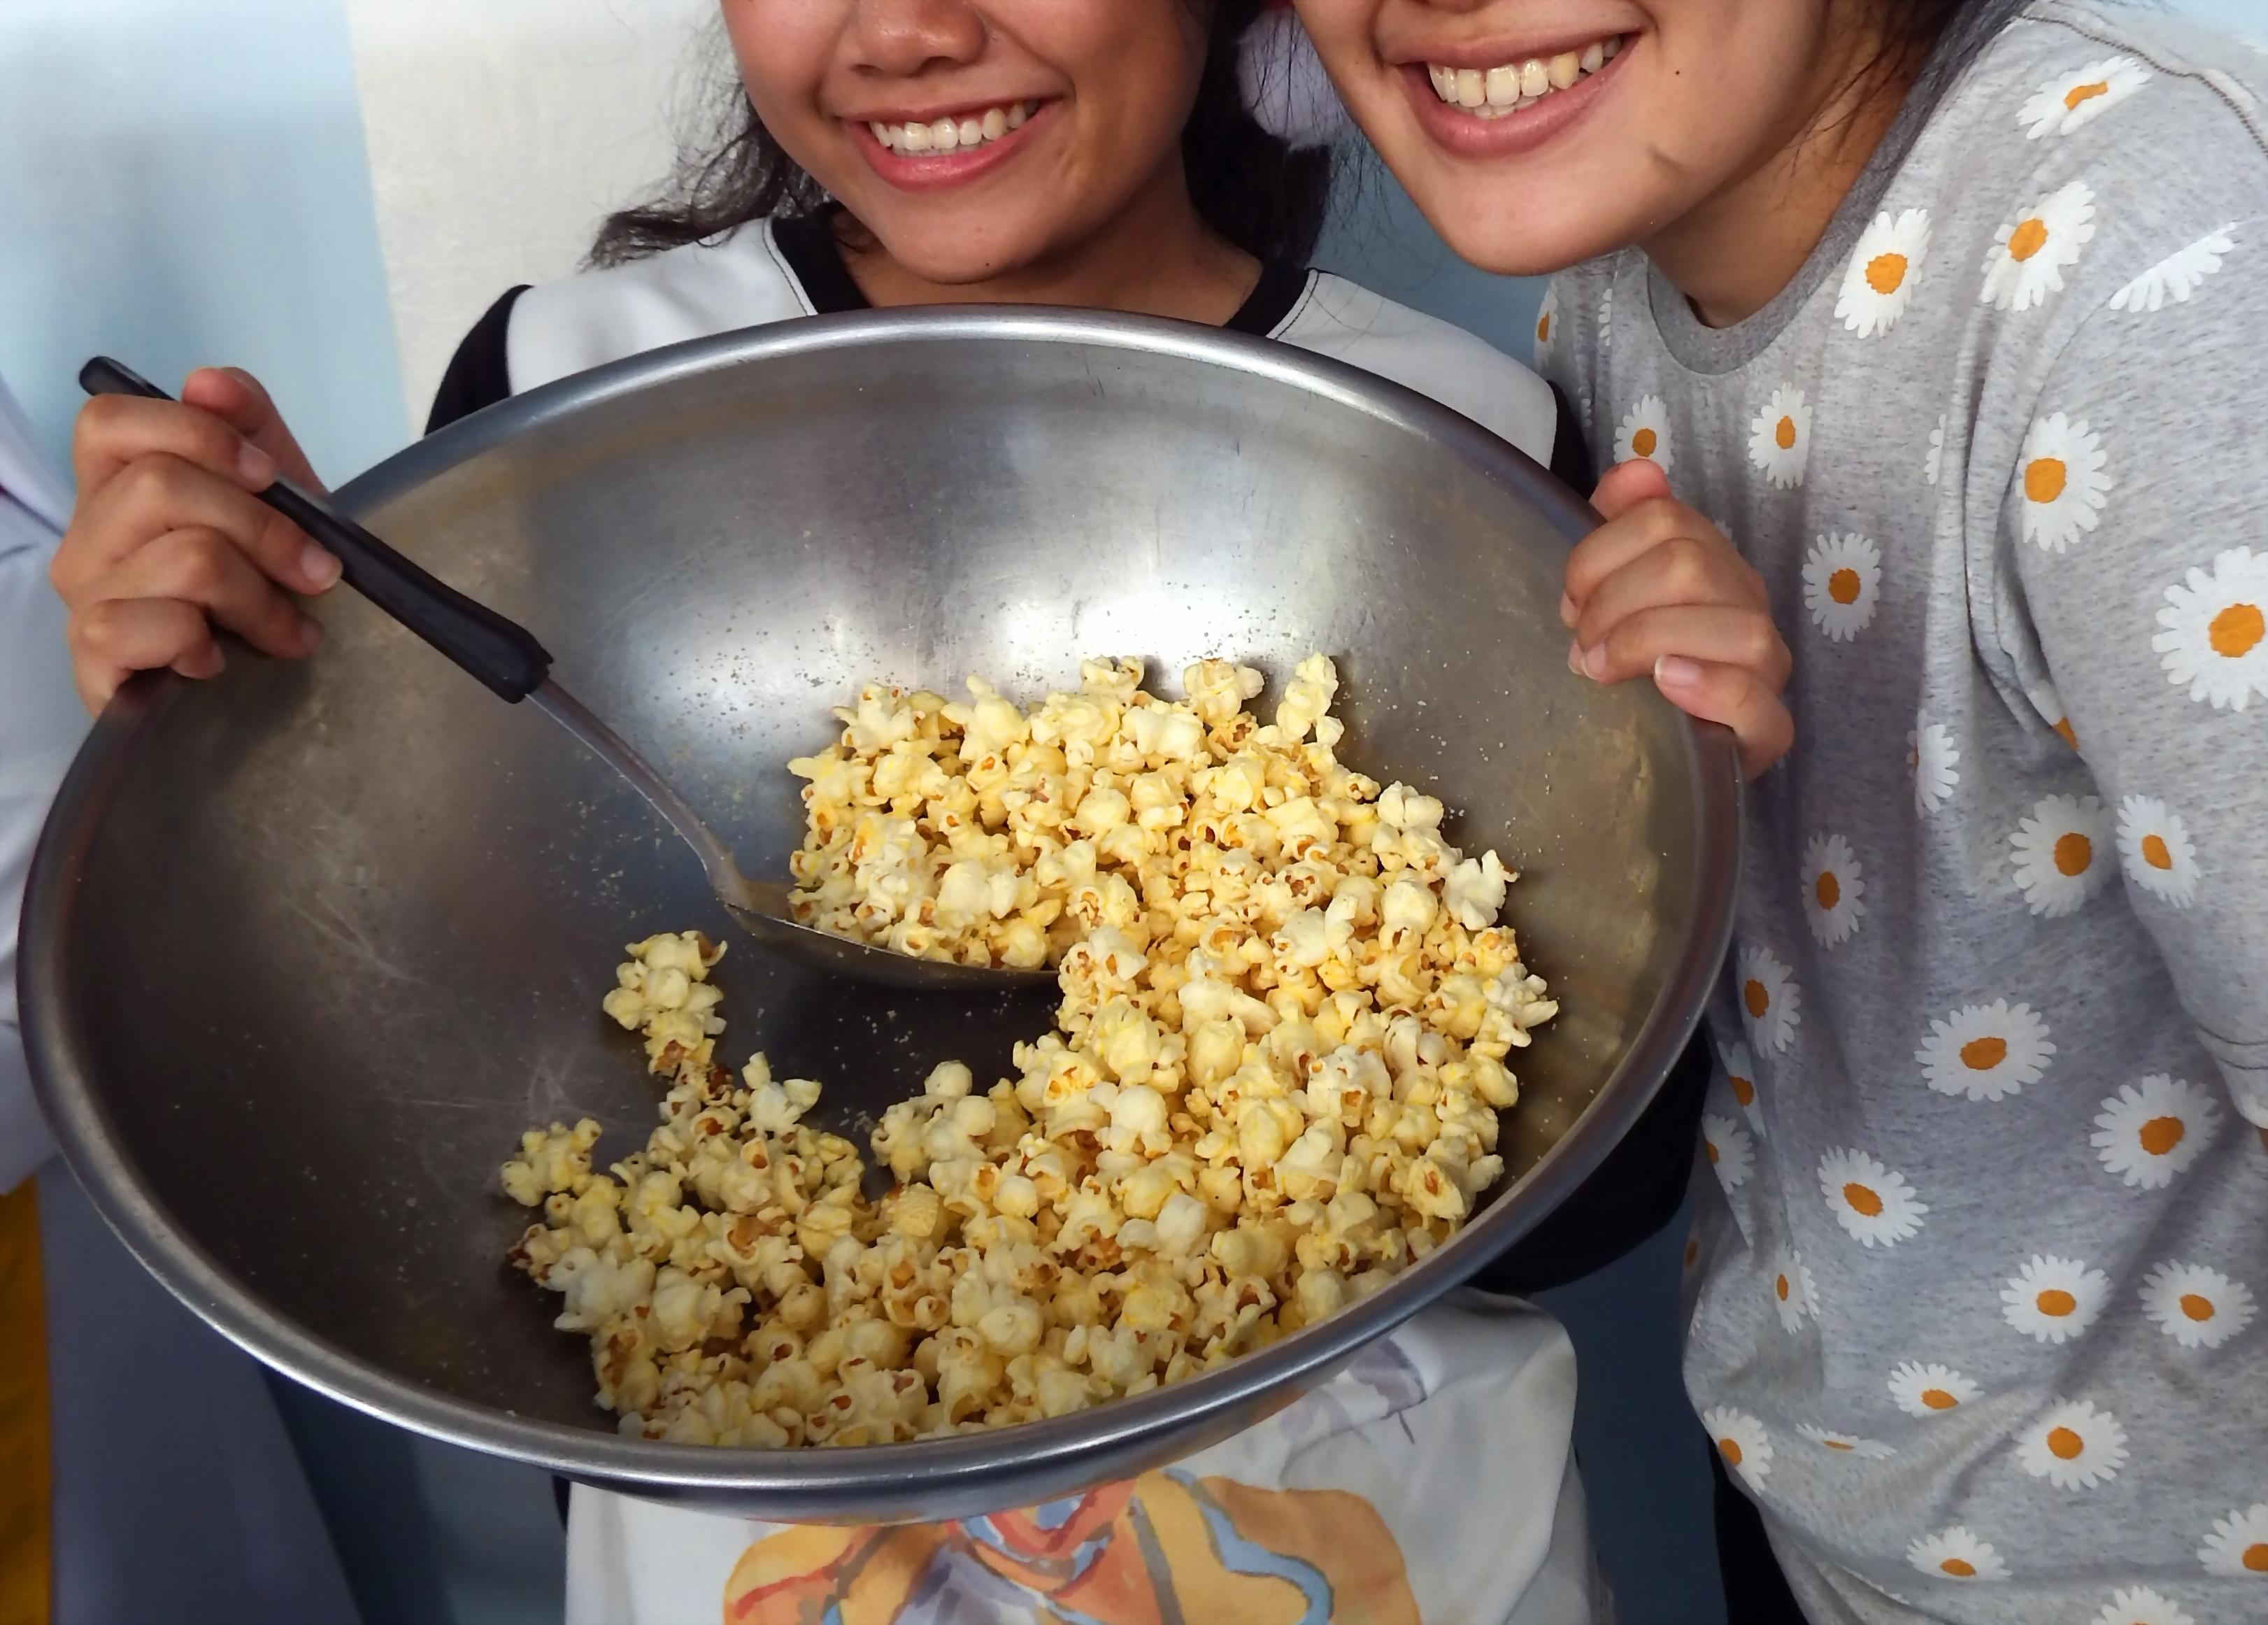 Making popcorn photo